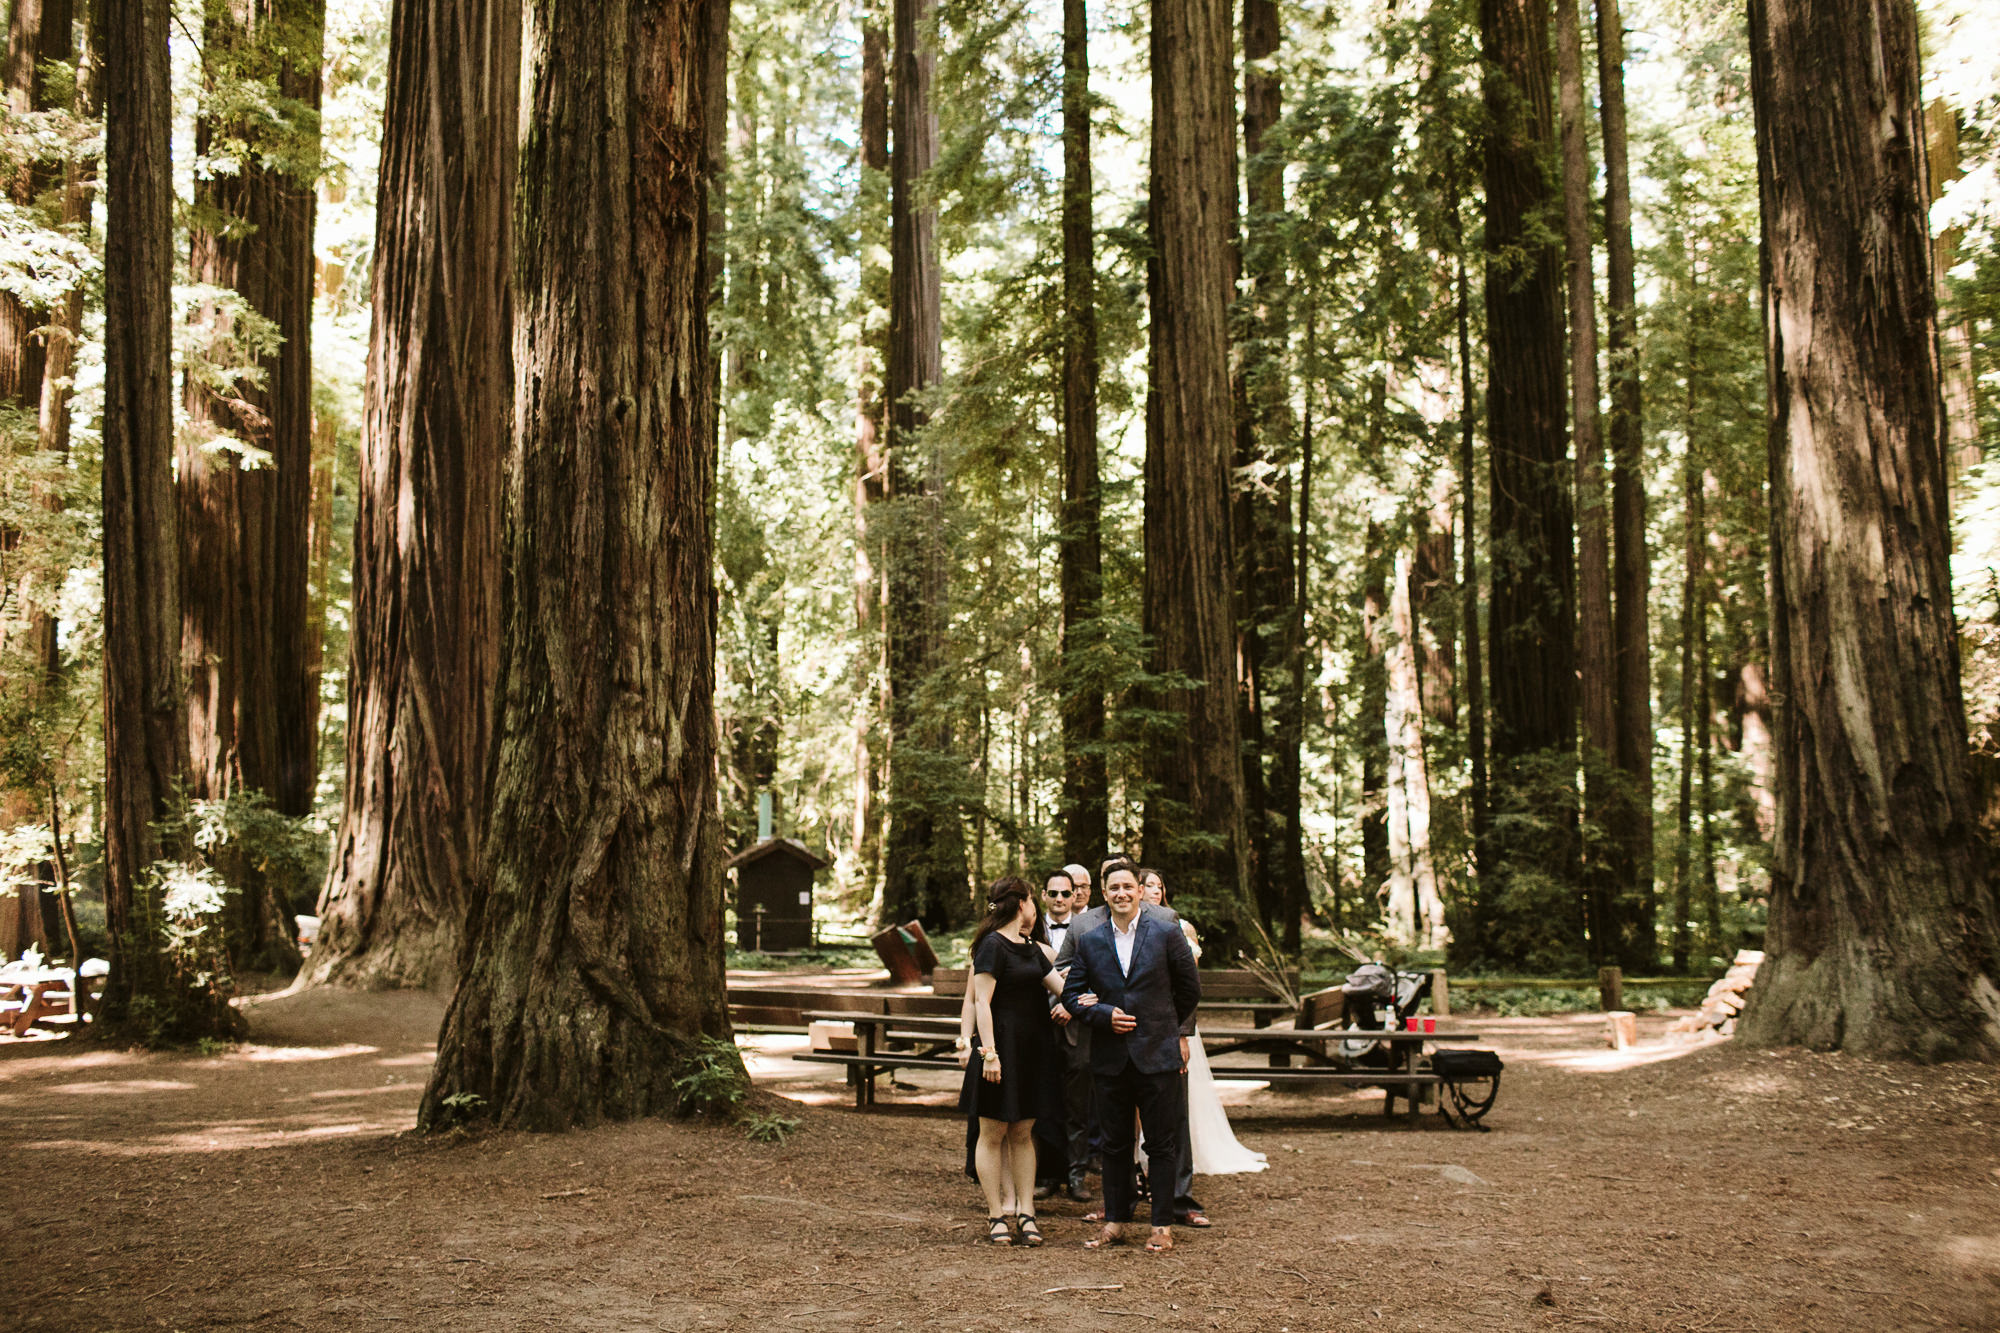 California-wedding-photographer-alfonso-flores-pamplin-groove-167.jpg